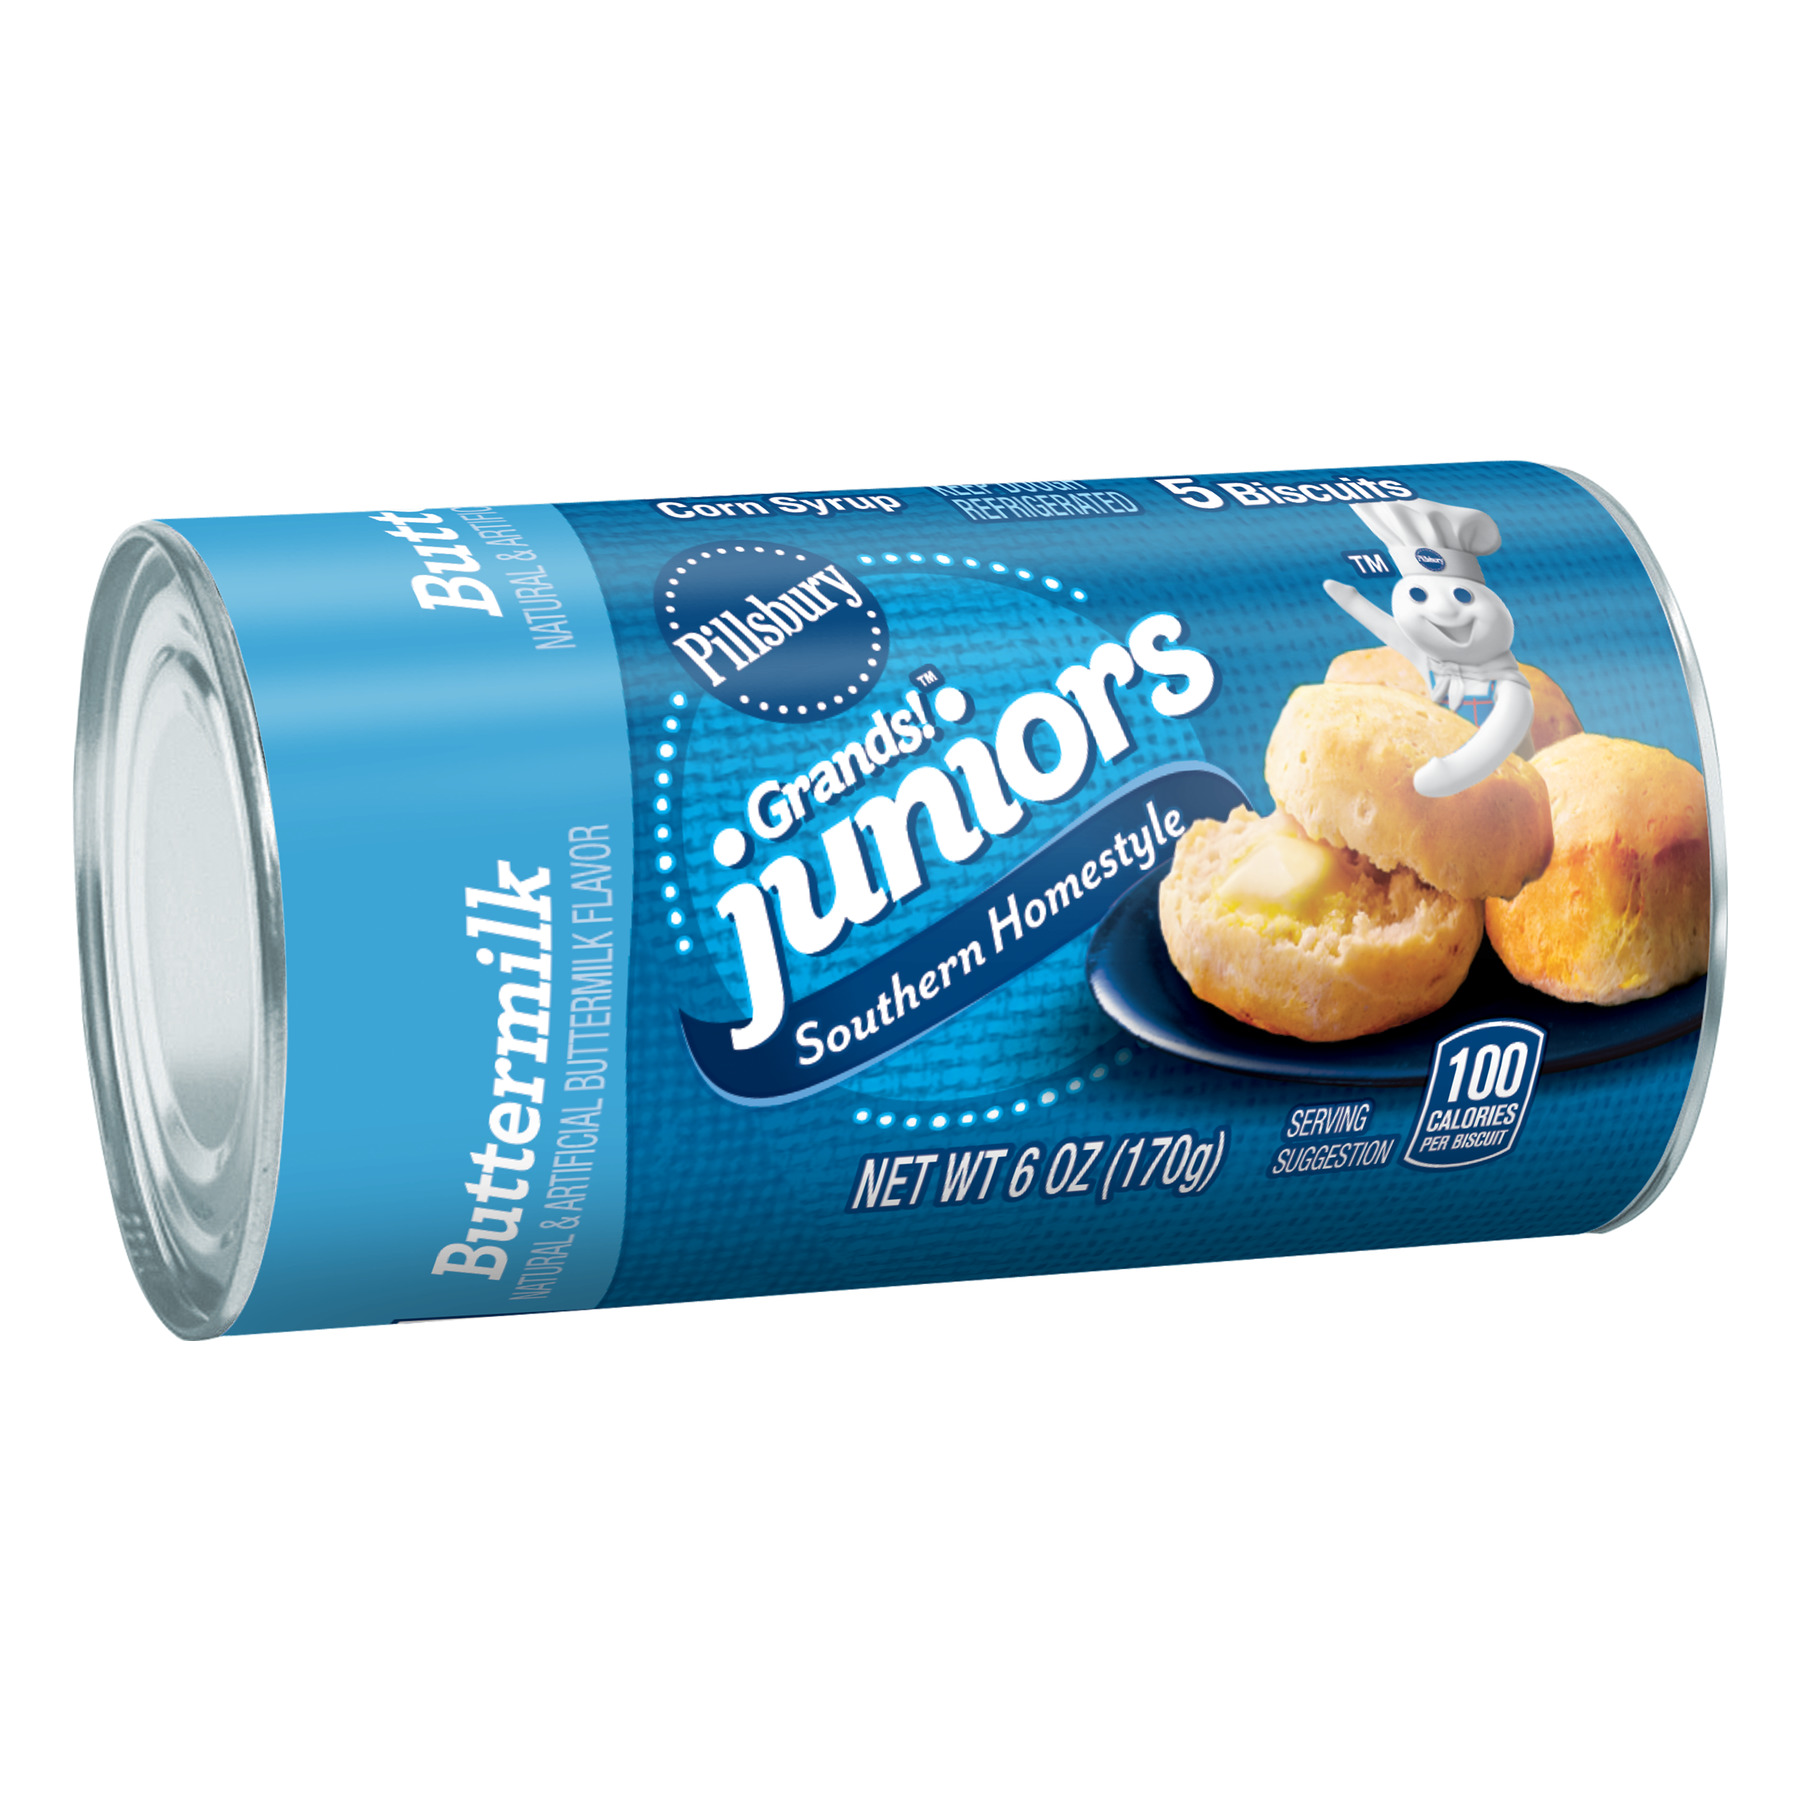 Pillsbury Grands! Juniors Southern Homestyle Buttermilk Biscuits, 5 Ct, 6 oz